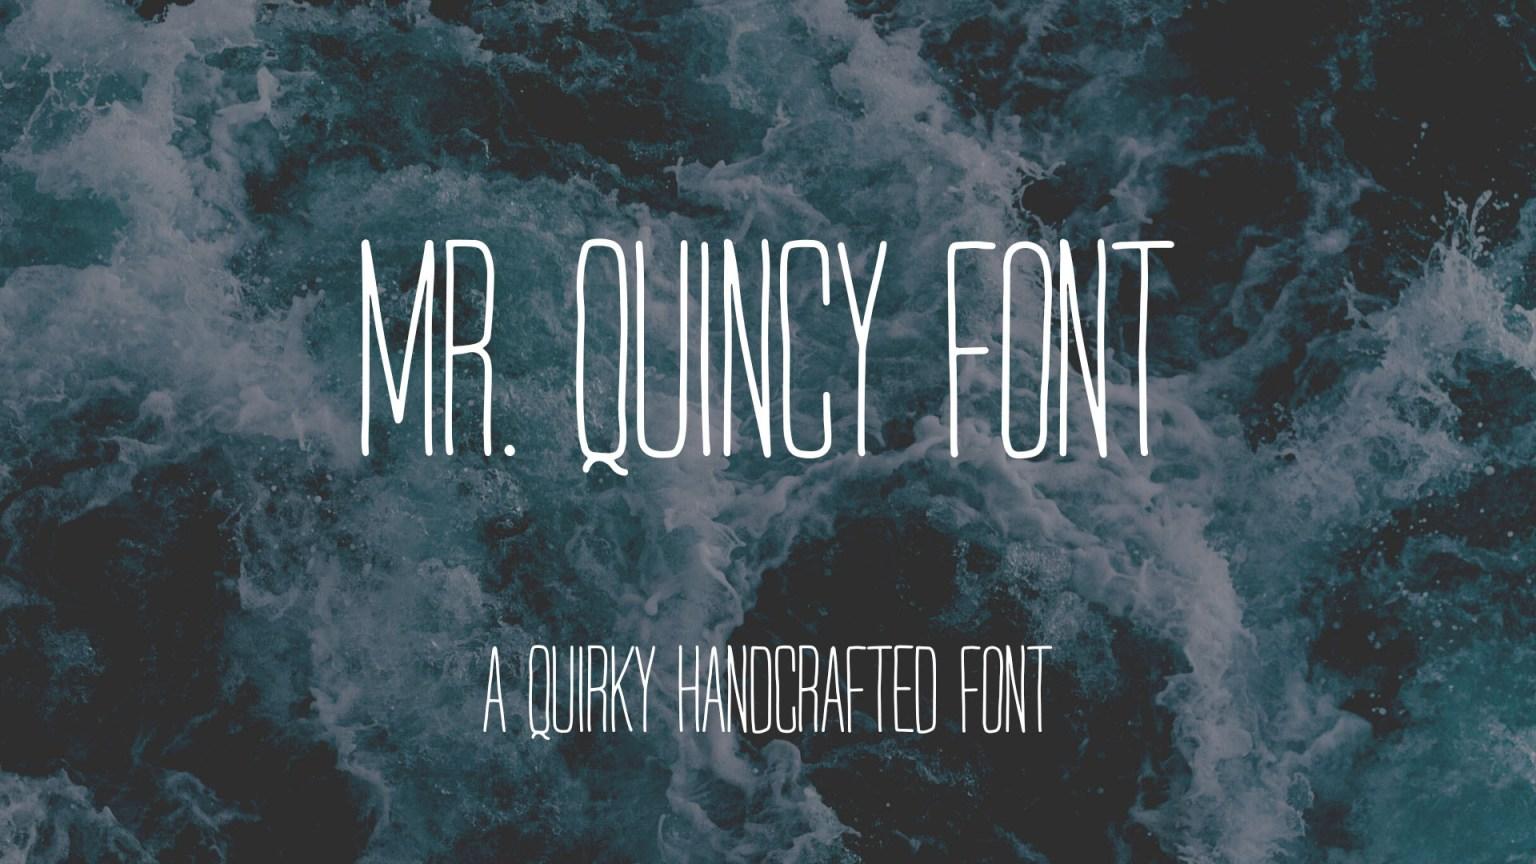 Mr Quincy Display Font